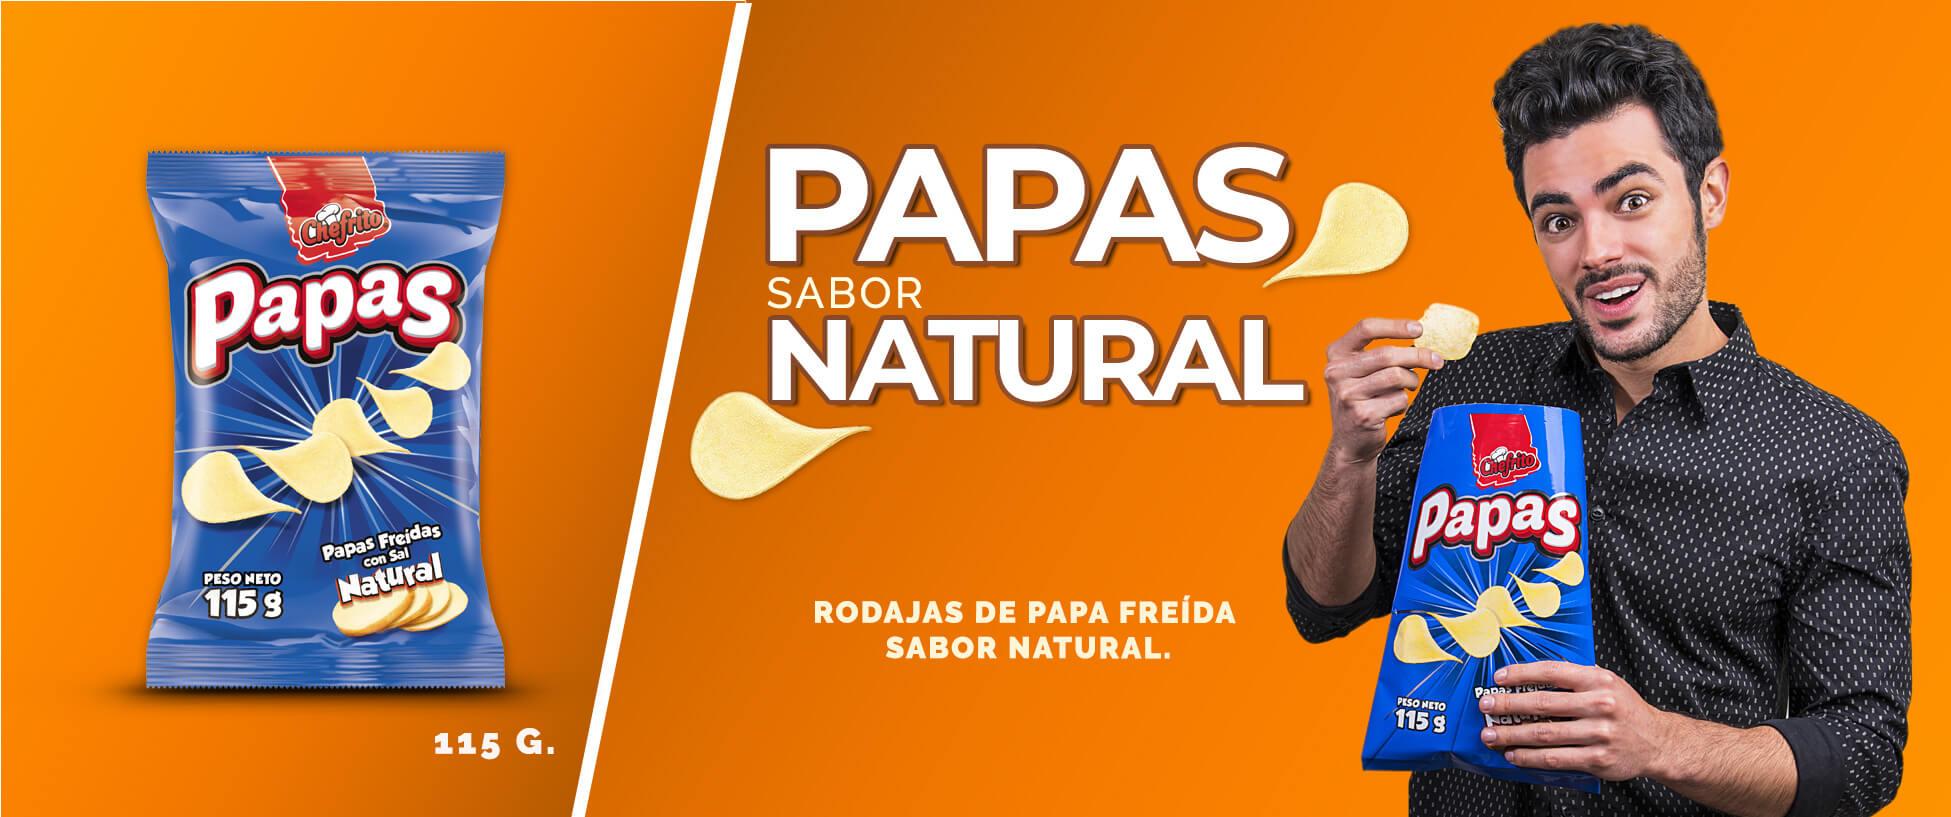 Papas 3